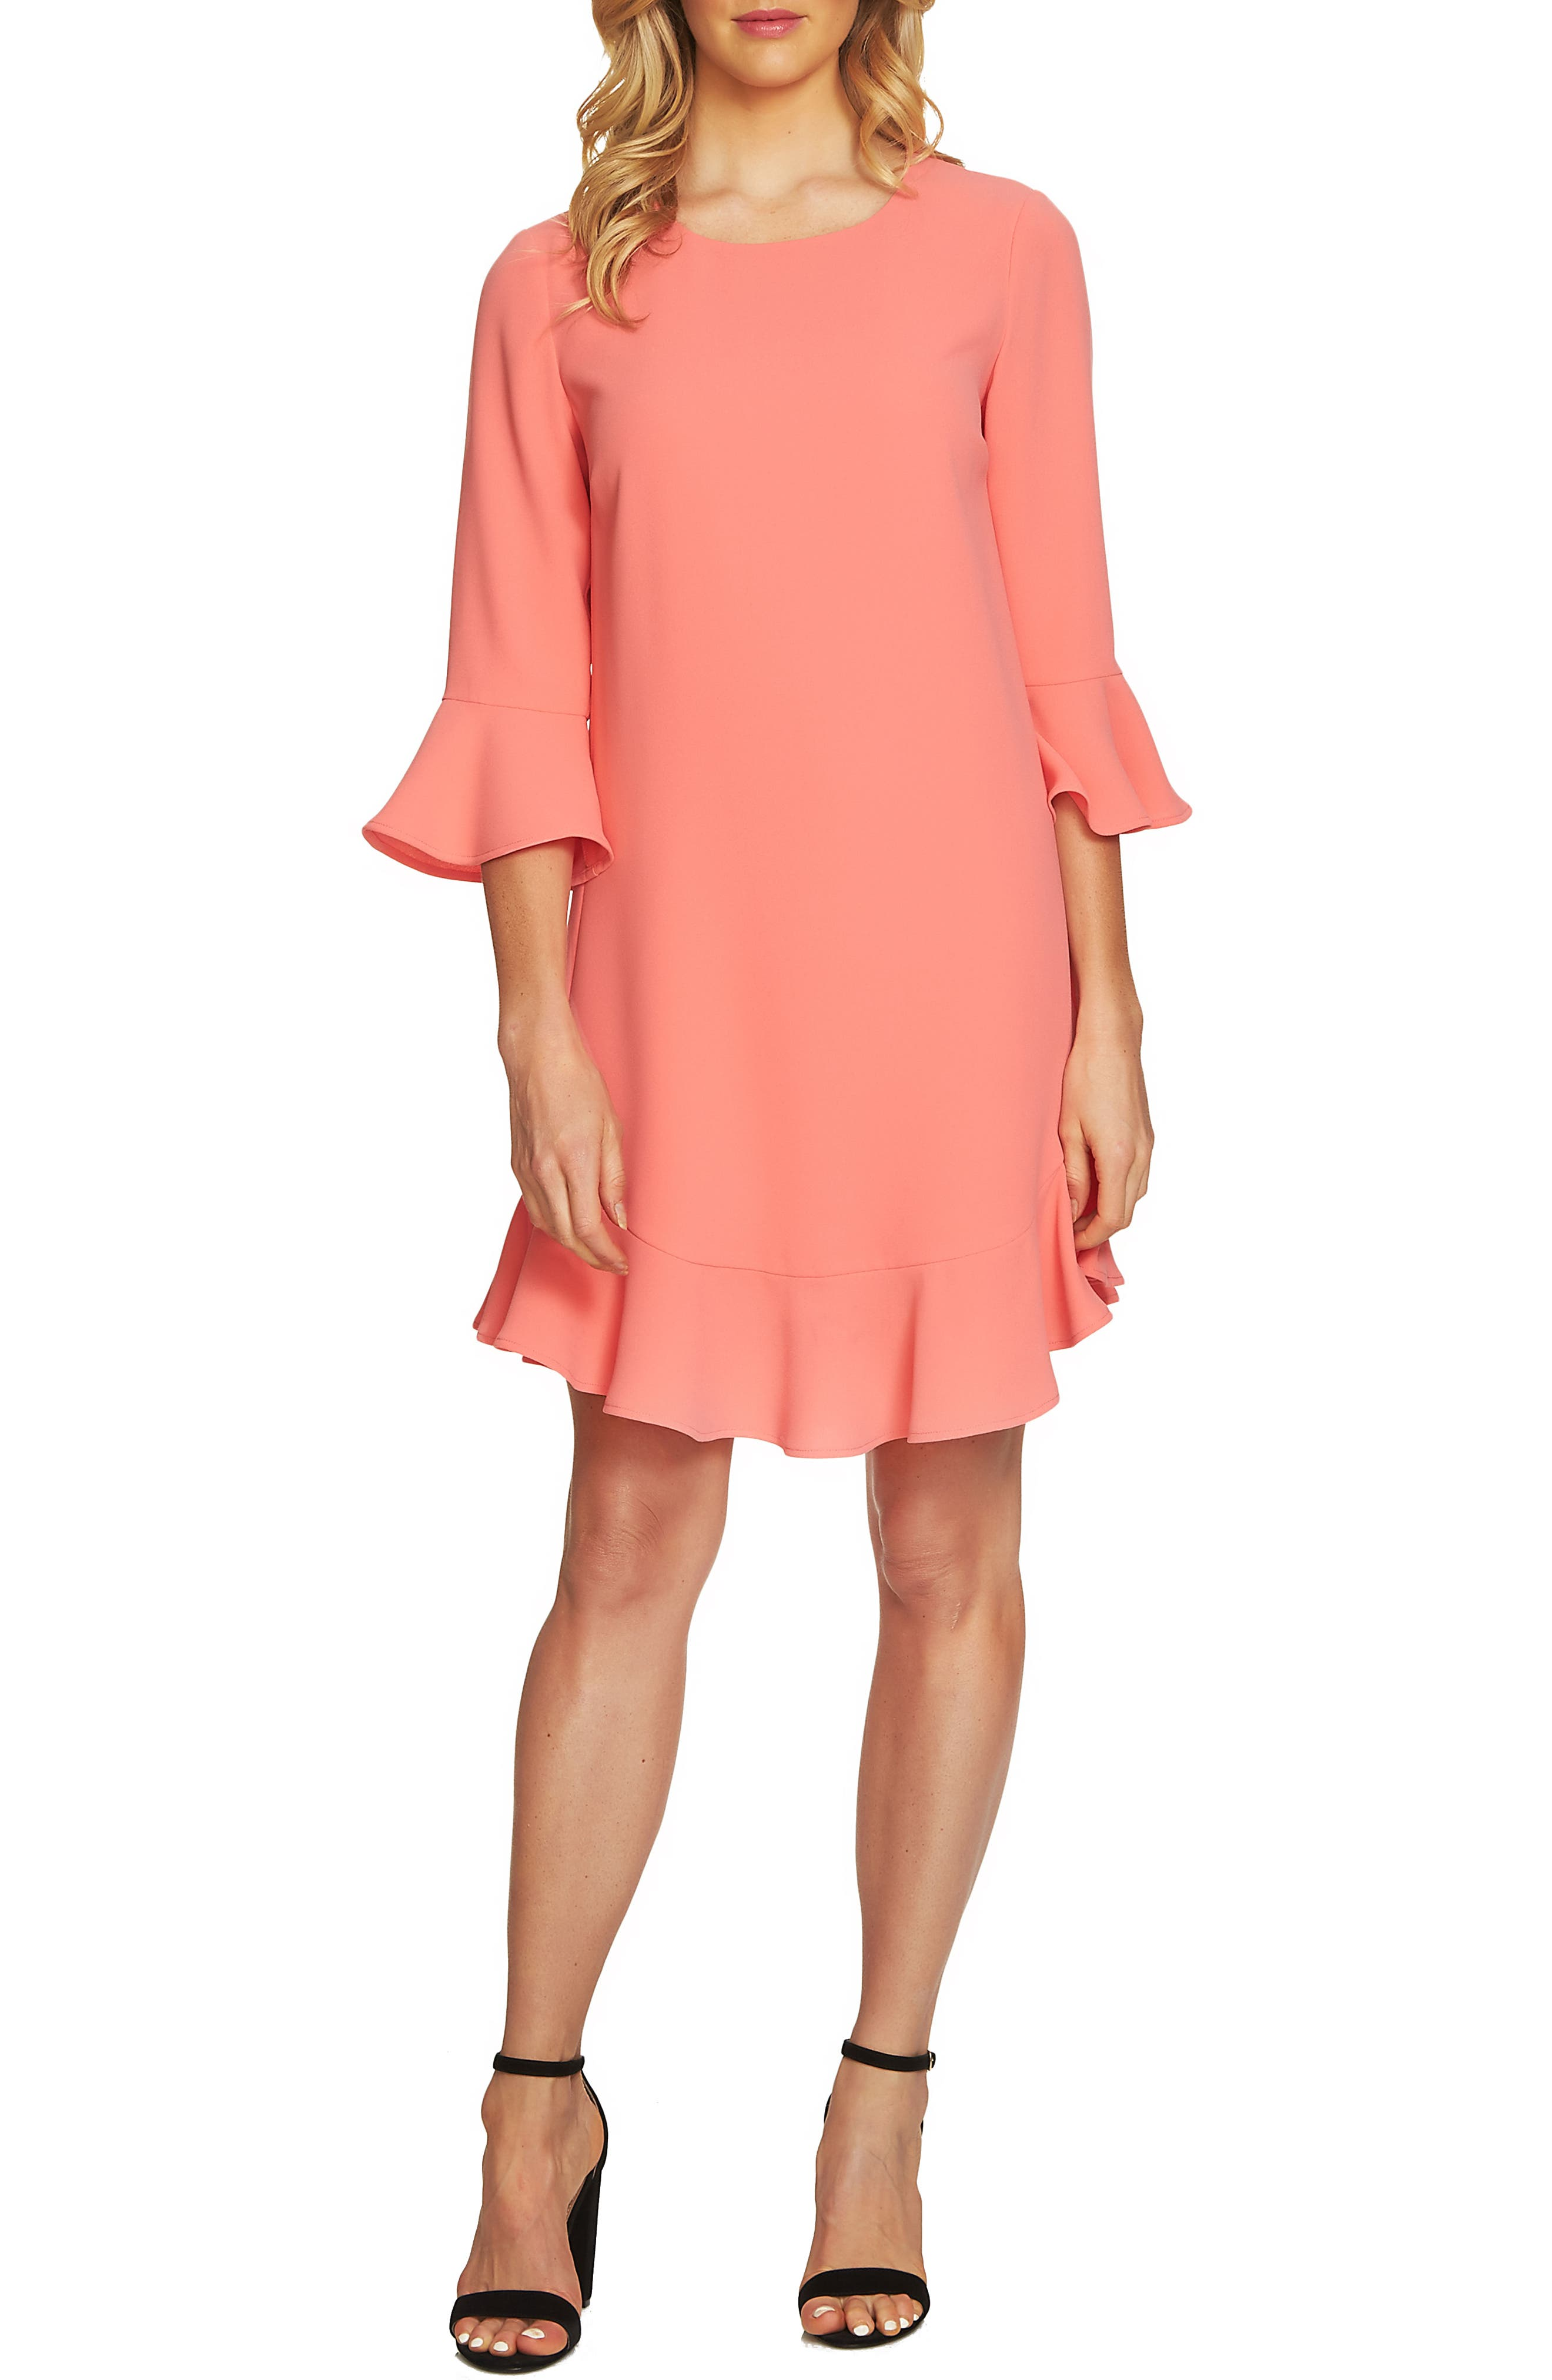 Alternate Image 1 Selected - CeCe Ruffle Hem Trim Dress